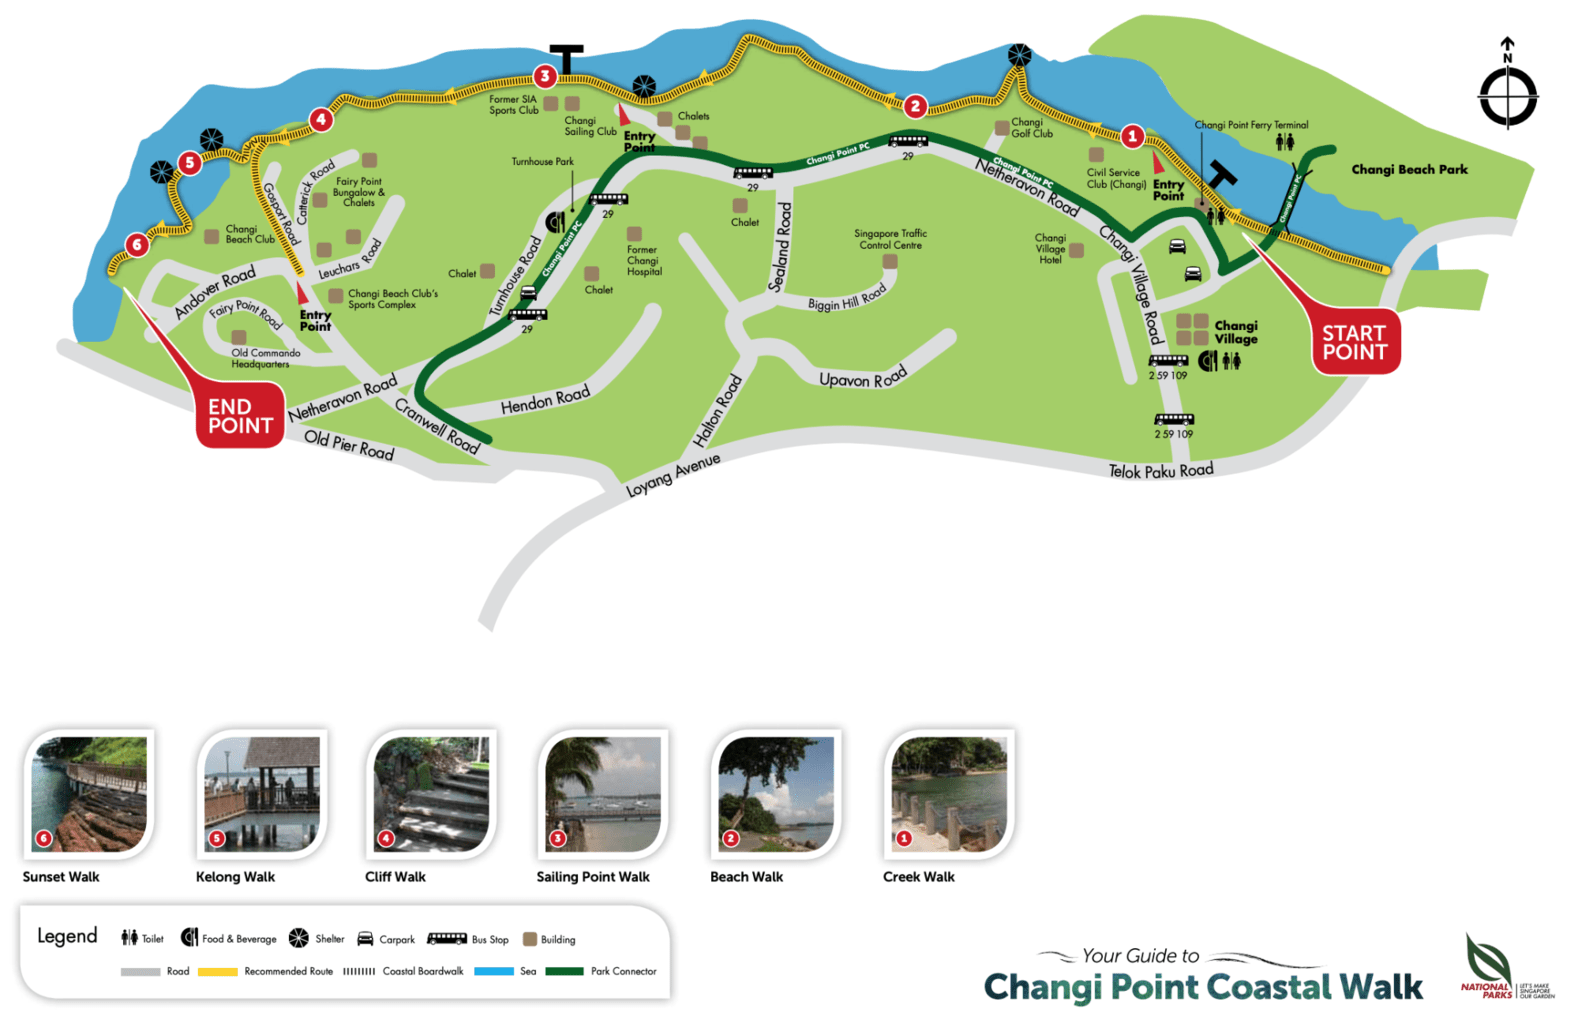 Changi Point Coastal Trail map